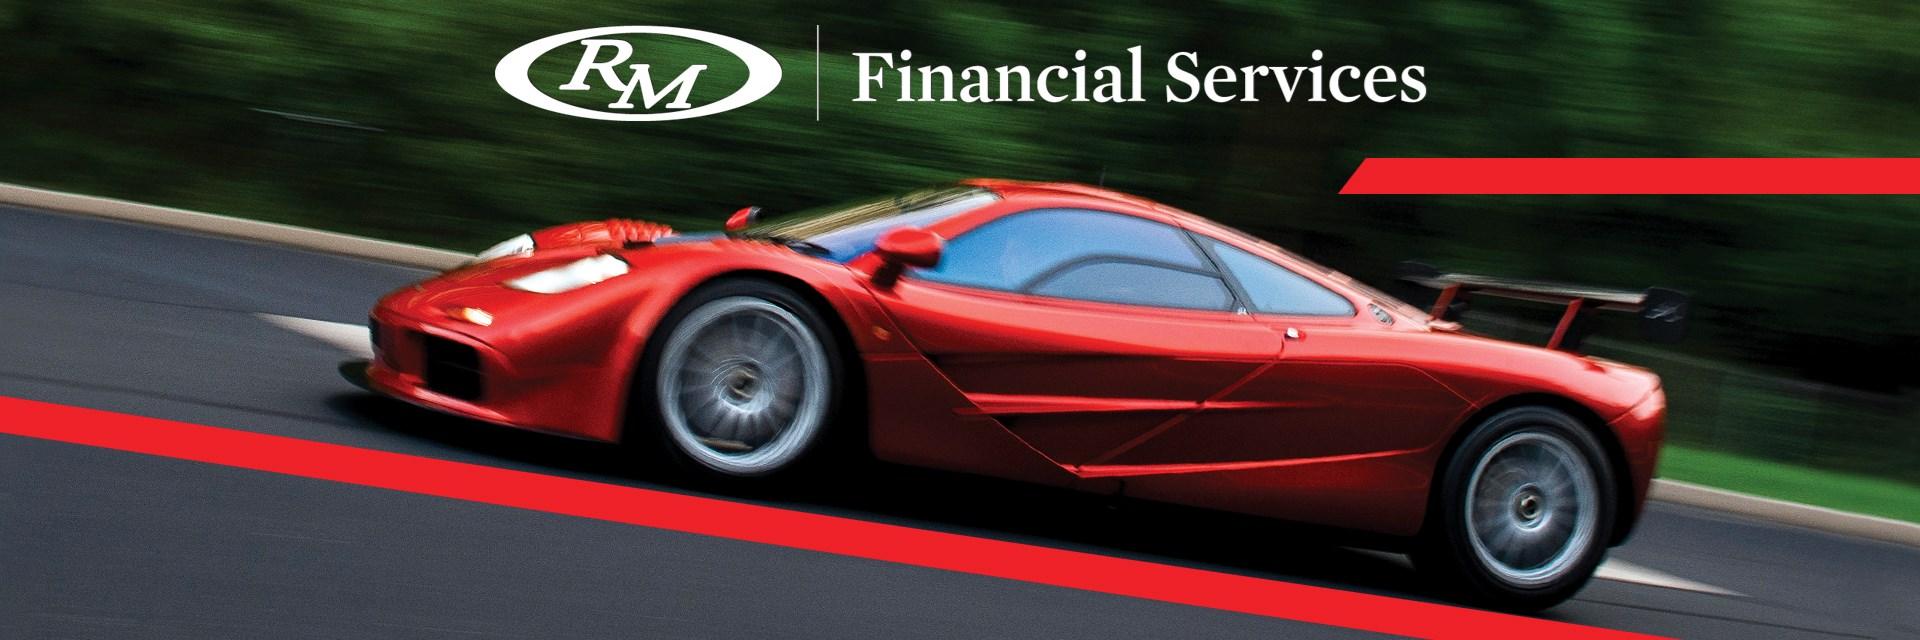 RM_FINANCIAL_McLaren1_WEB_STRIP.jpg